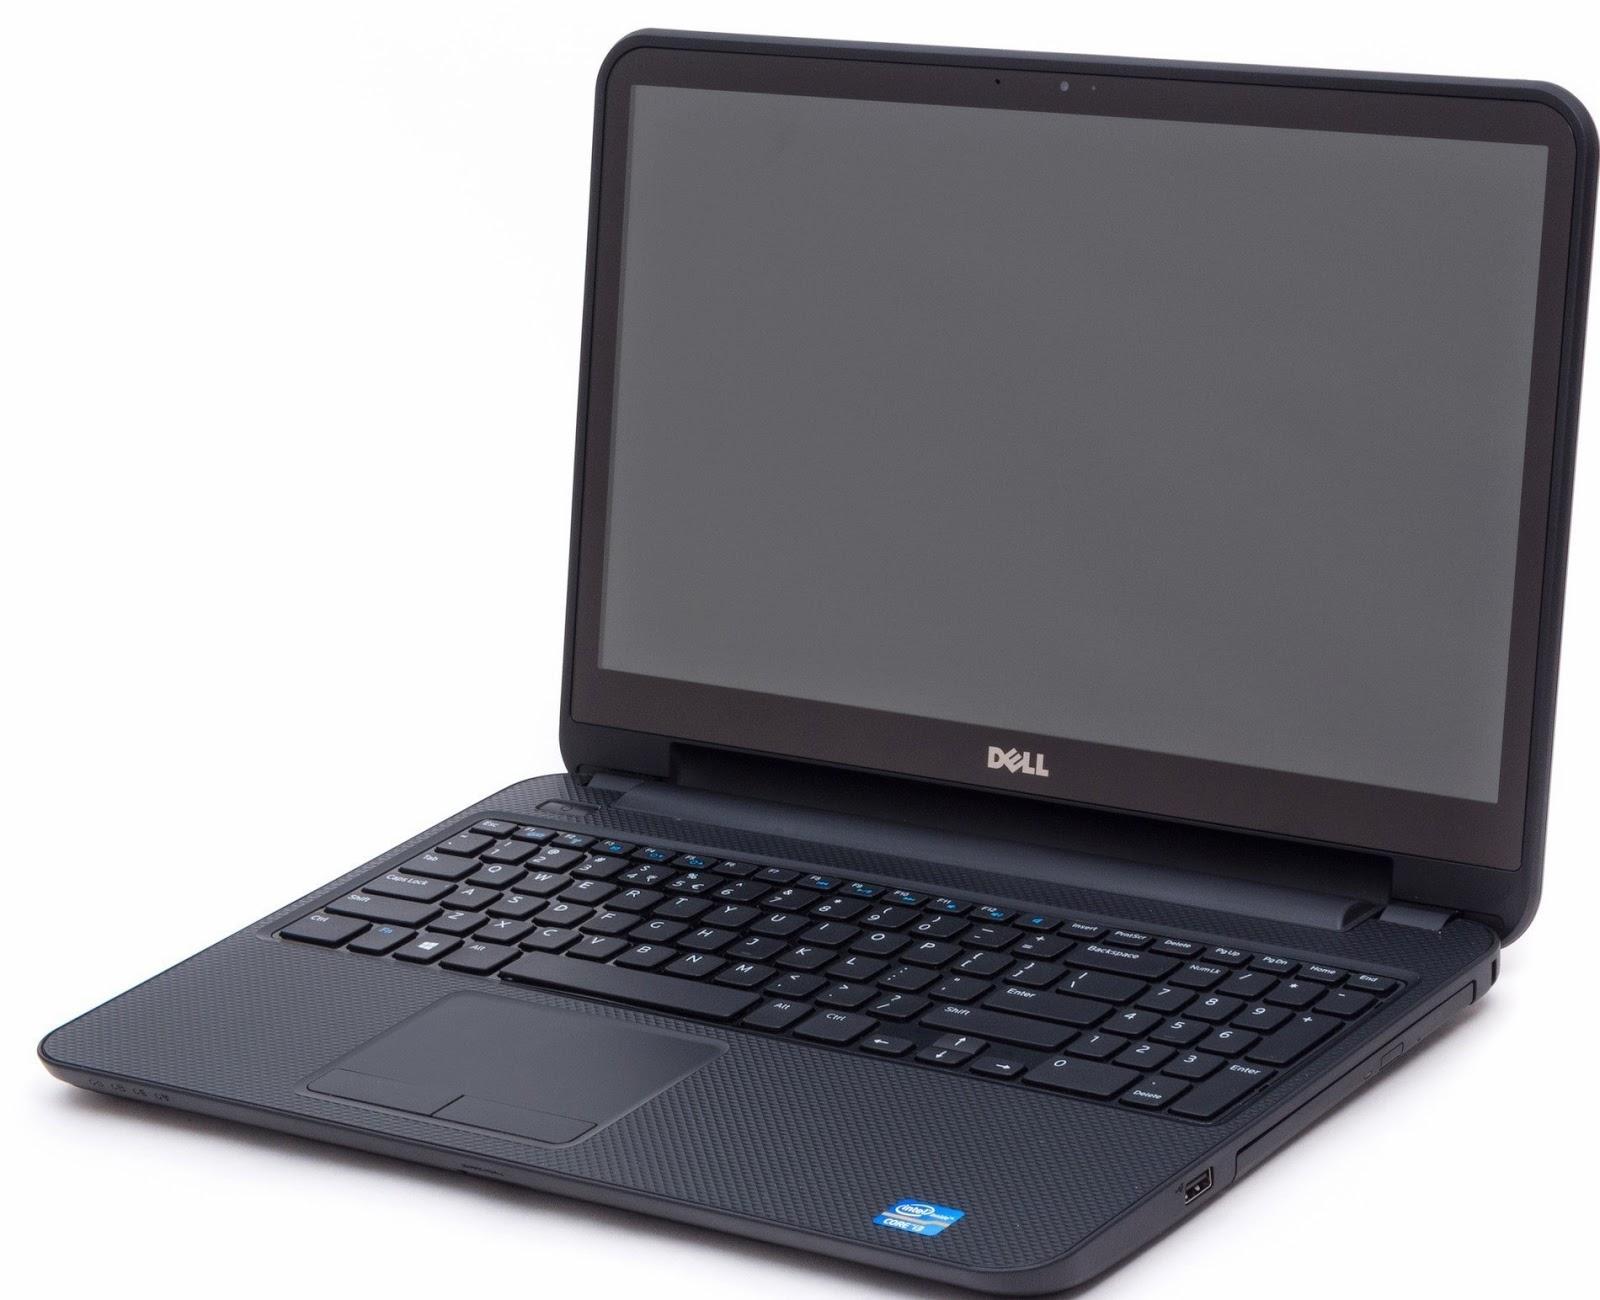 Dell inspiron 1300 oem drivers :: buckbespdespo